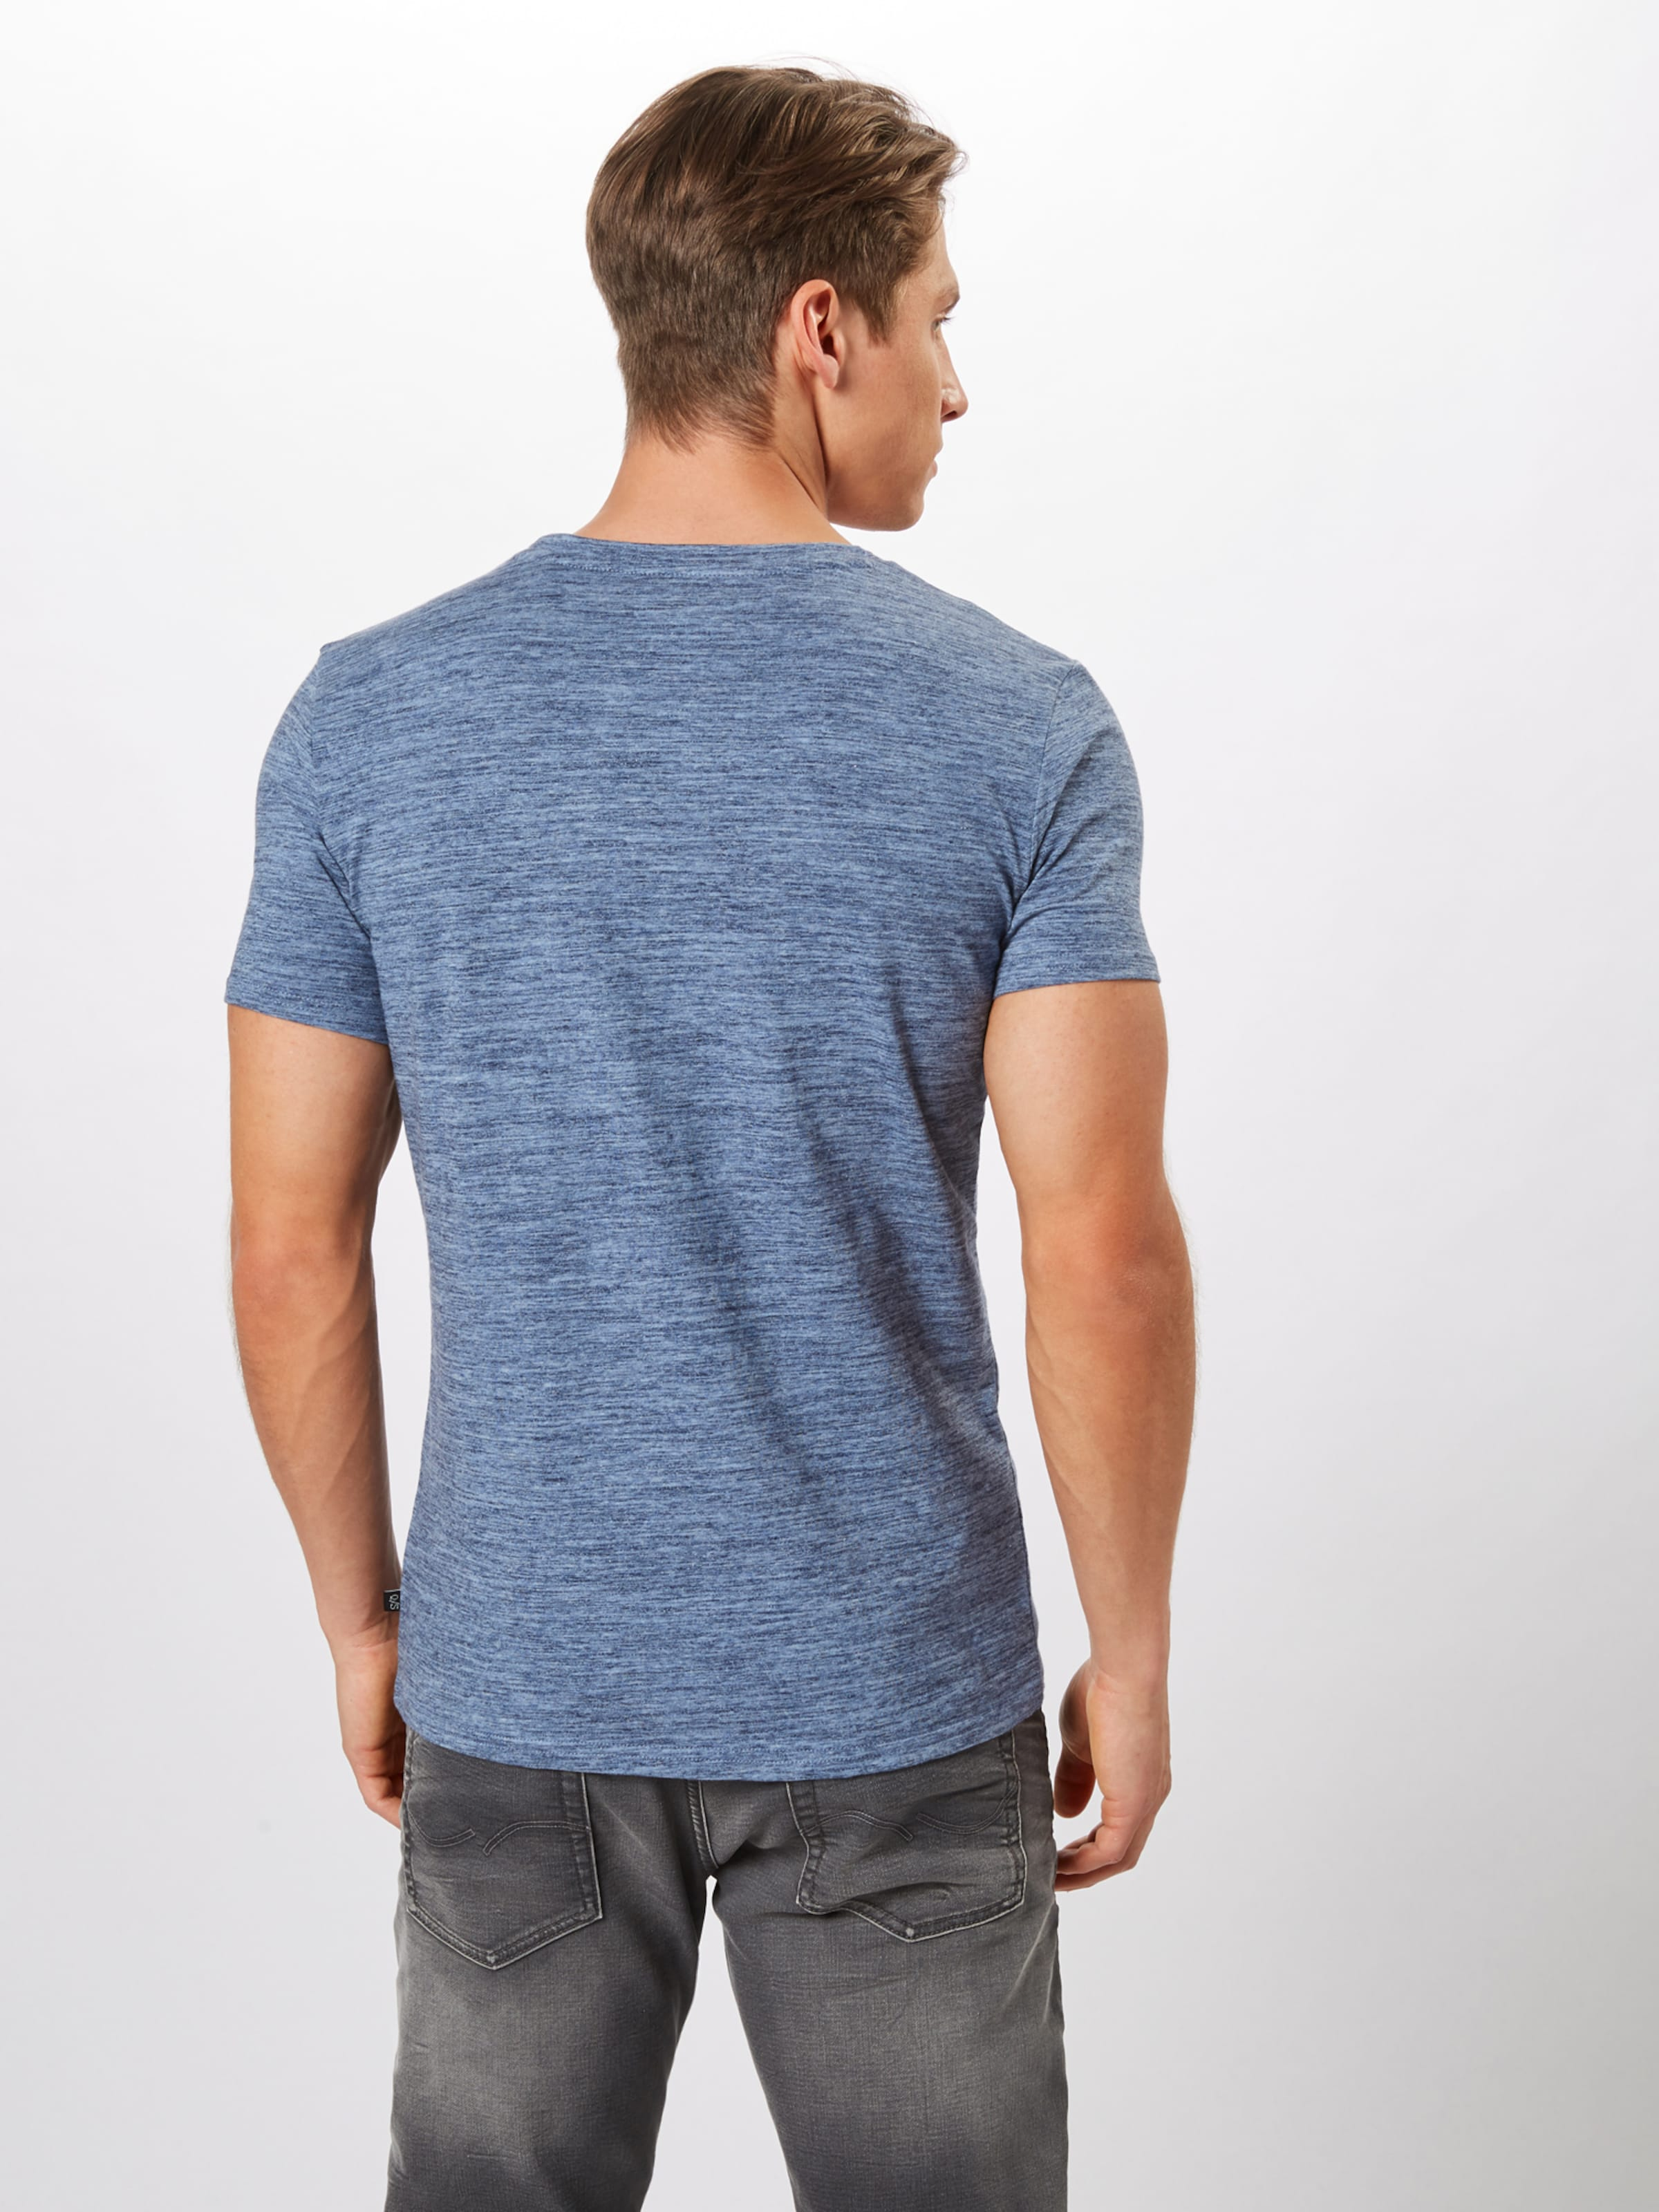 s In Q Royalblau Designed By Shirt 4RS5A3jLcq